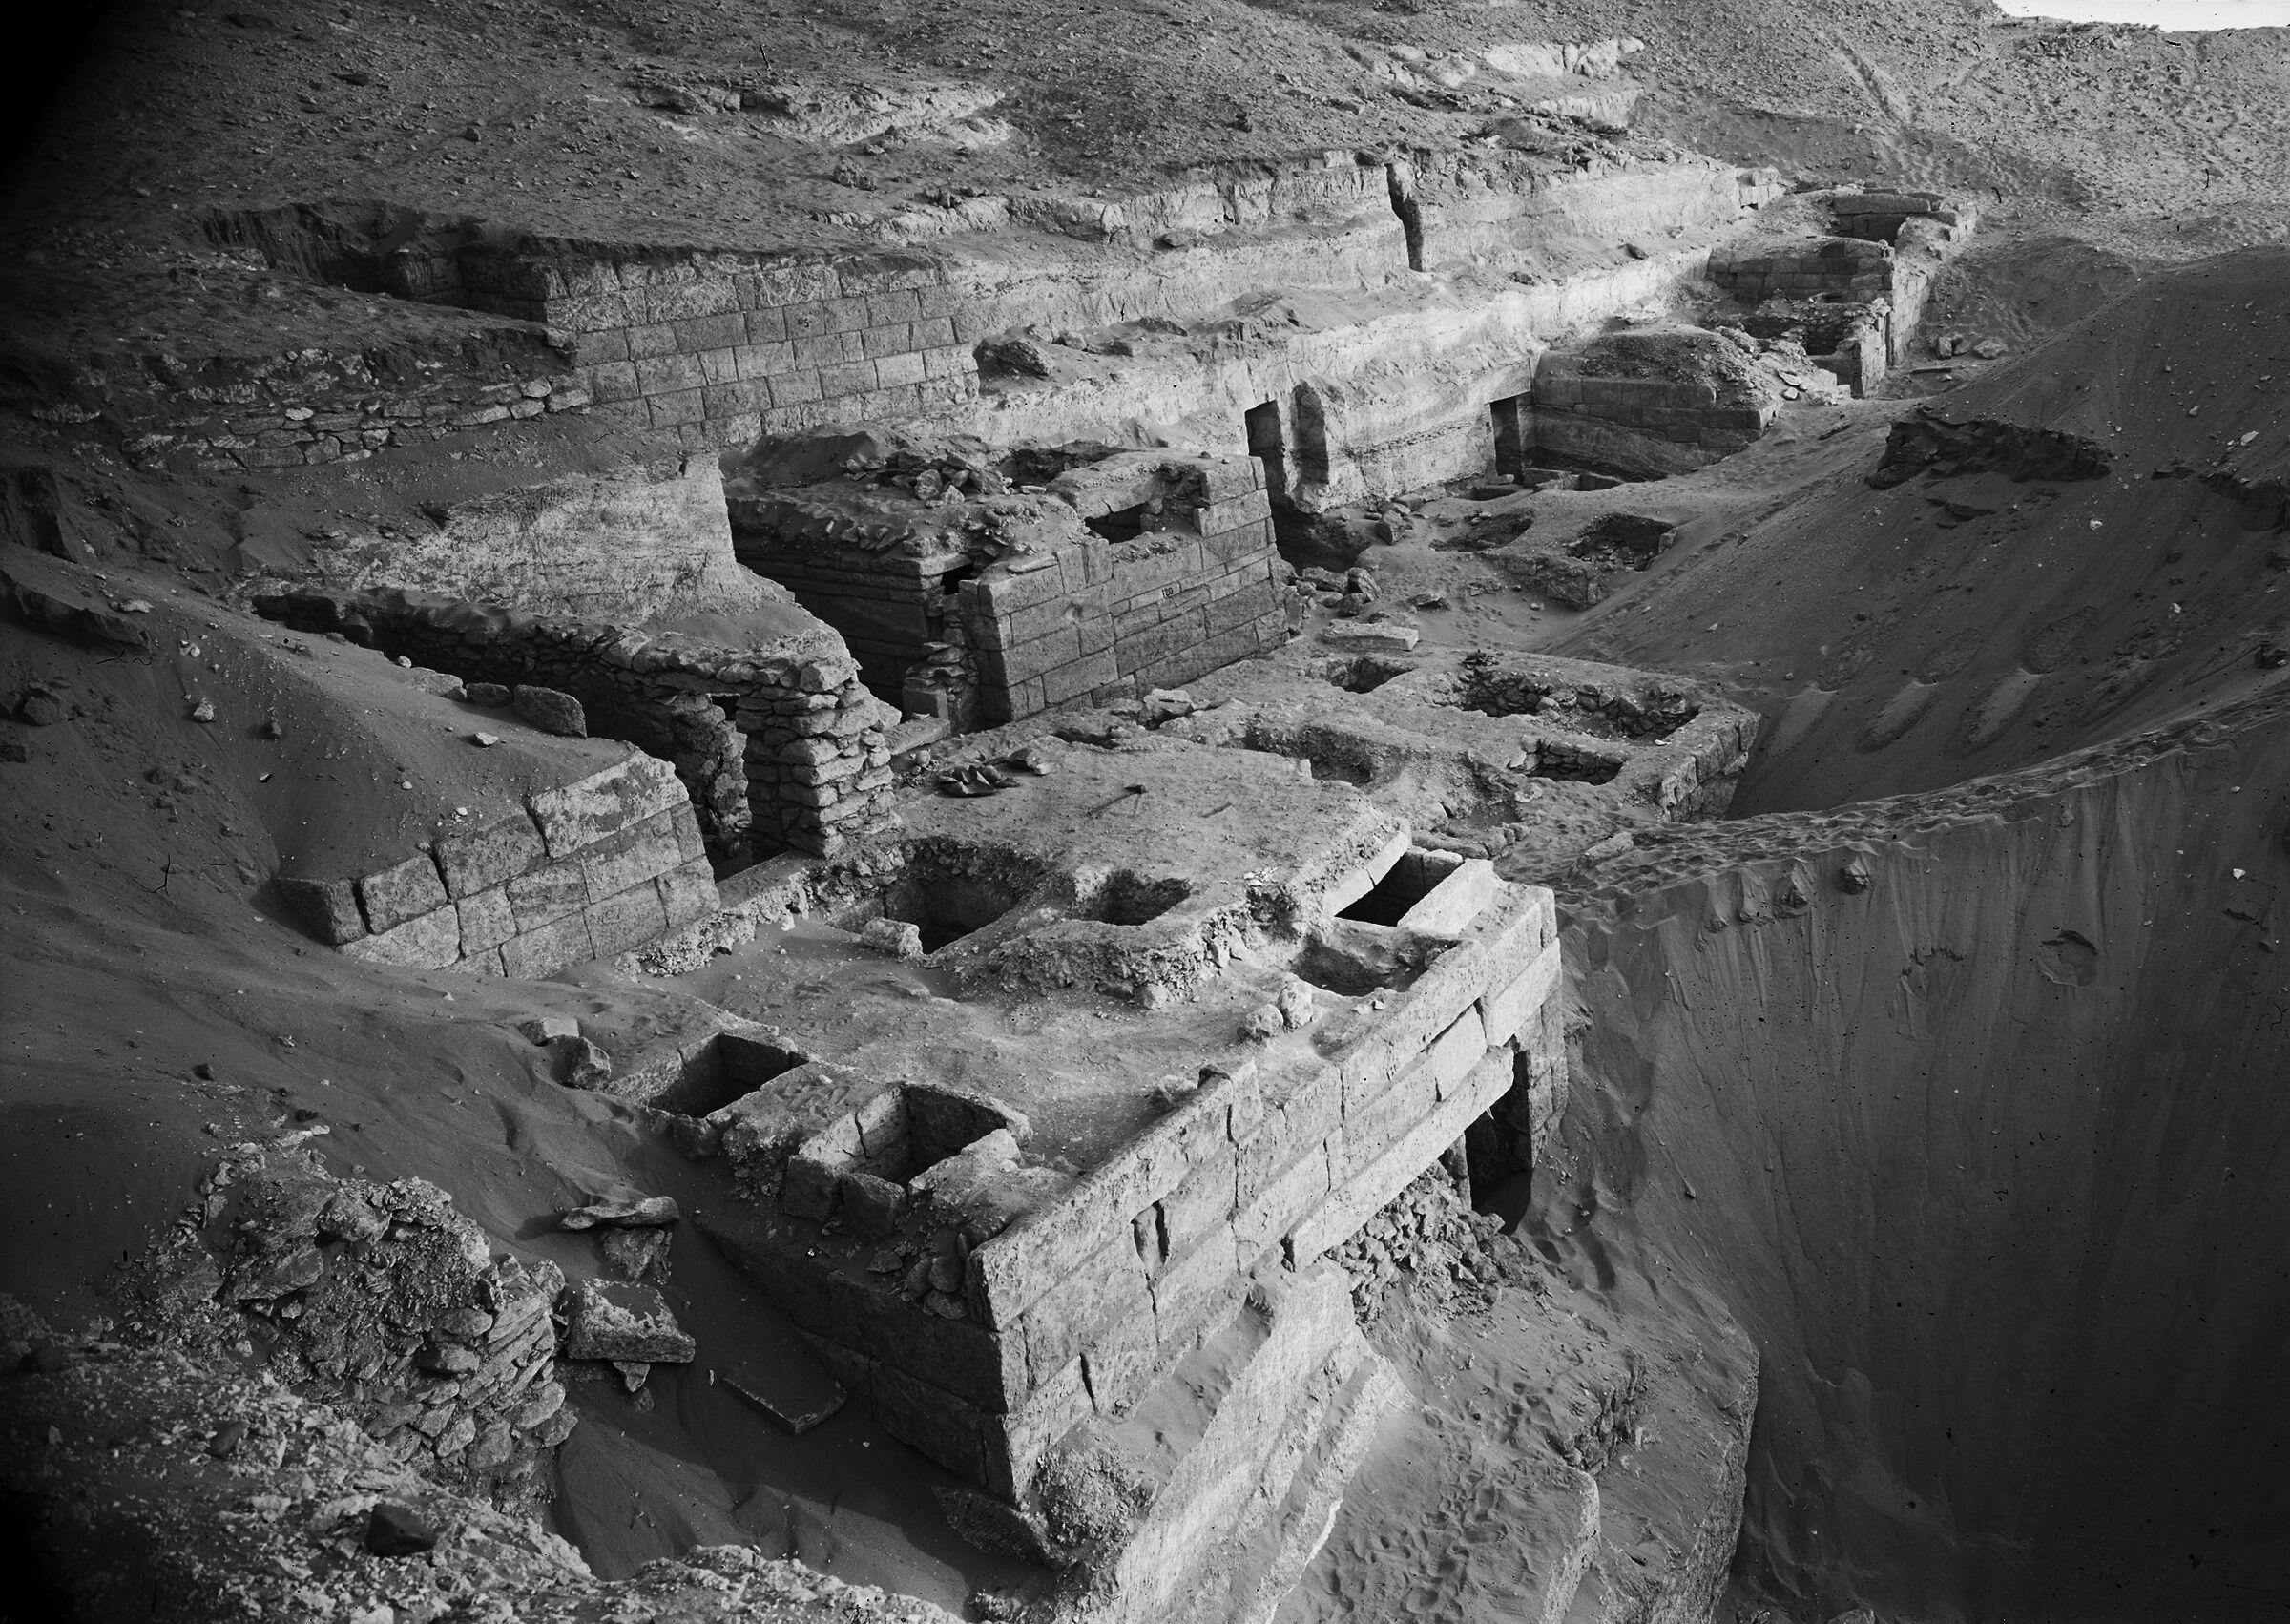 Menkaure Quarry Cemetery: Site: Giza; View: MQ 120, MQ 105, MQ 106, MQ 121, MQ 130, MQ 132, MQ 133, MQ 134, MQ 135, MQ 123, MQ 136